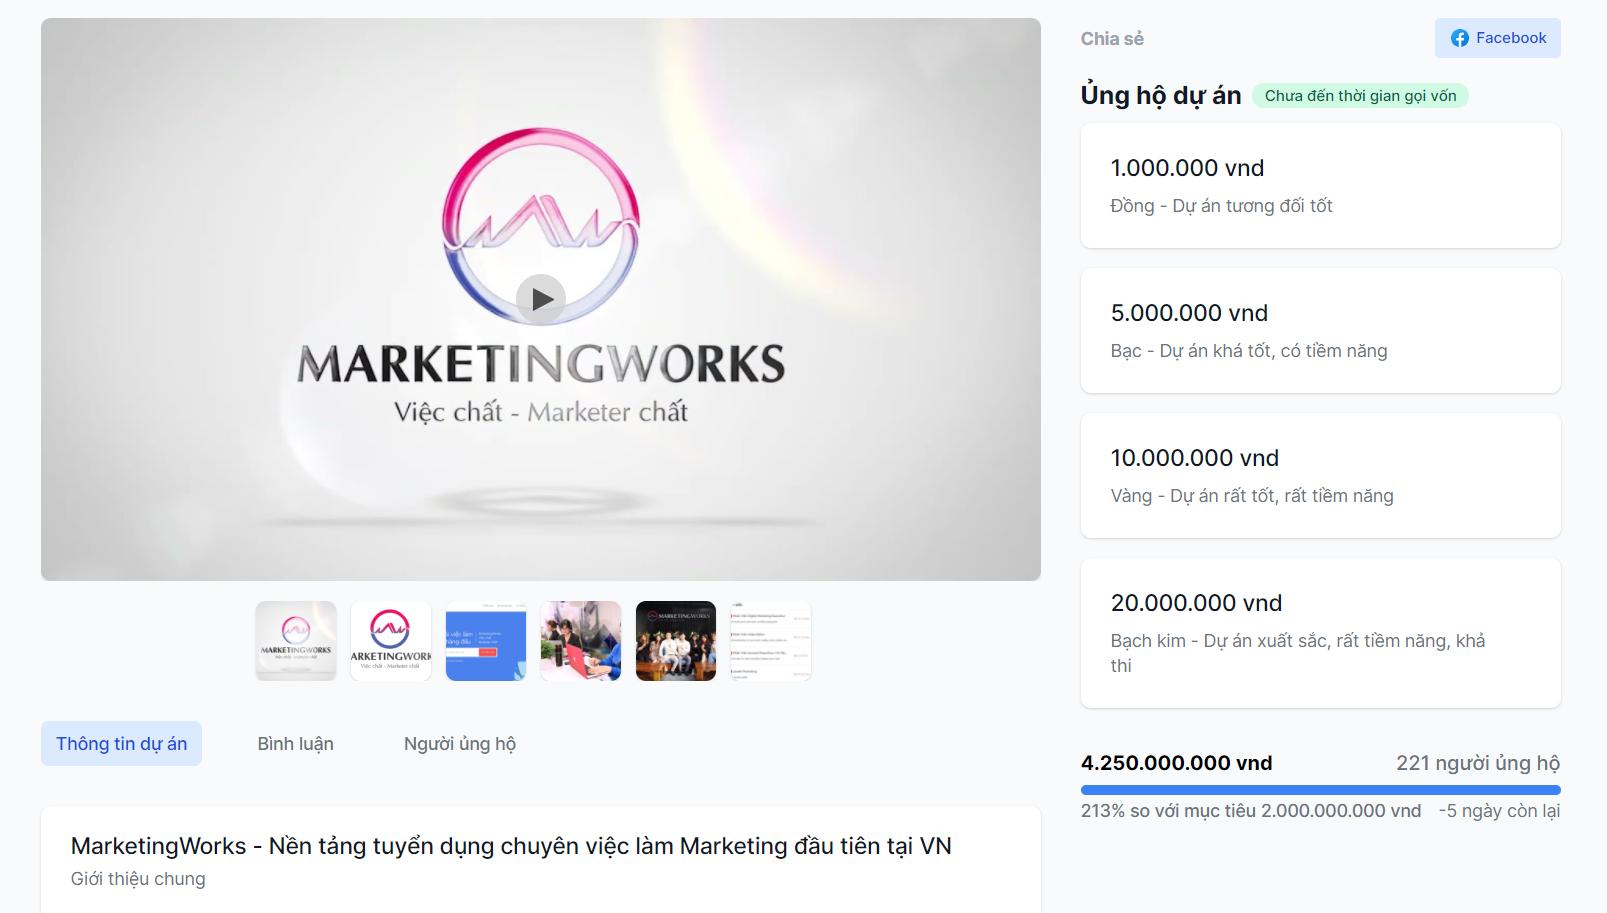 MarketingWorks_goi_von_cong_dong